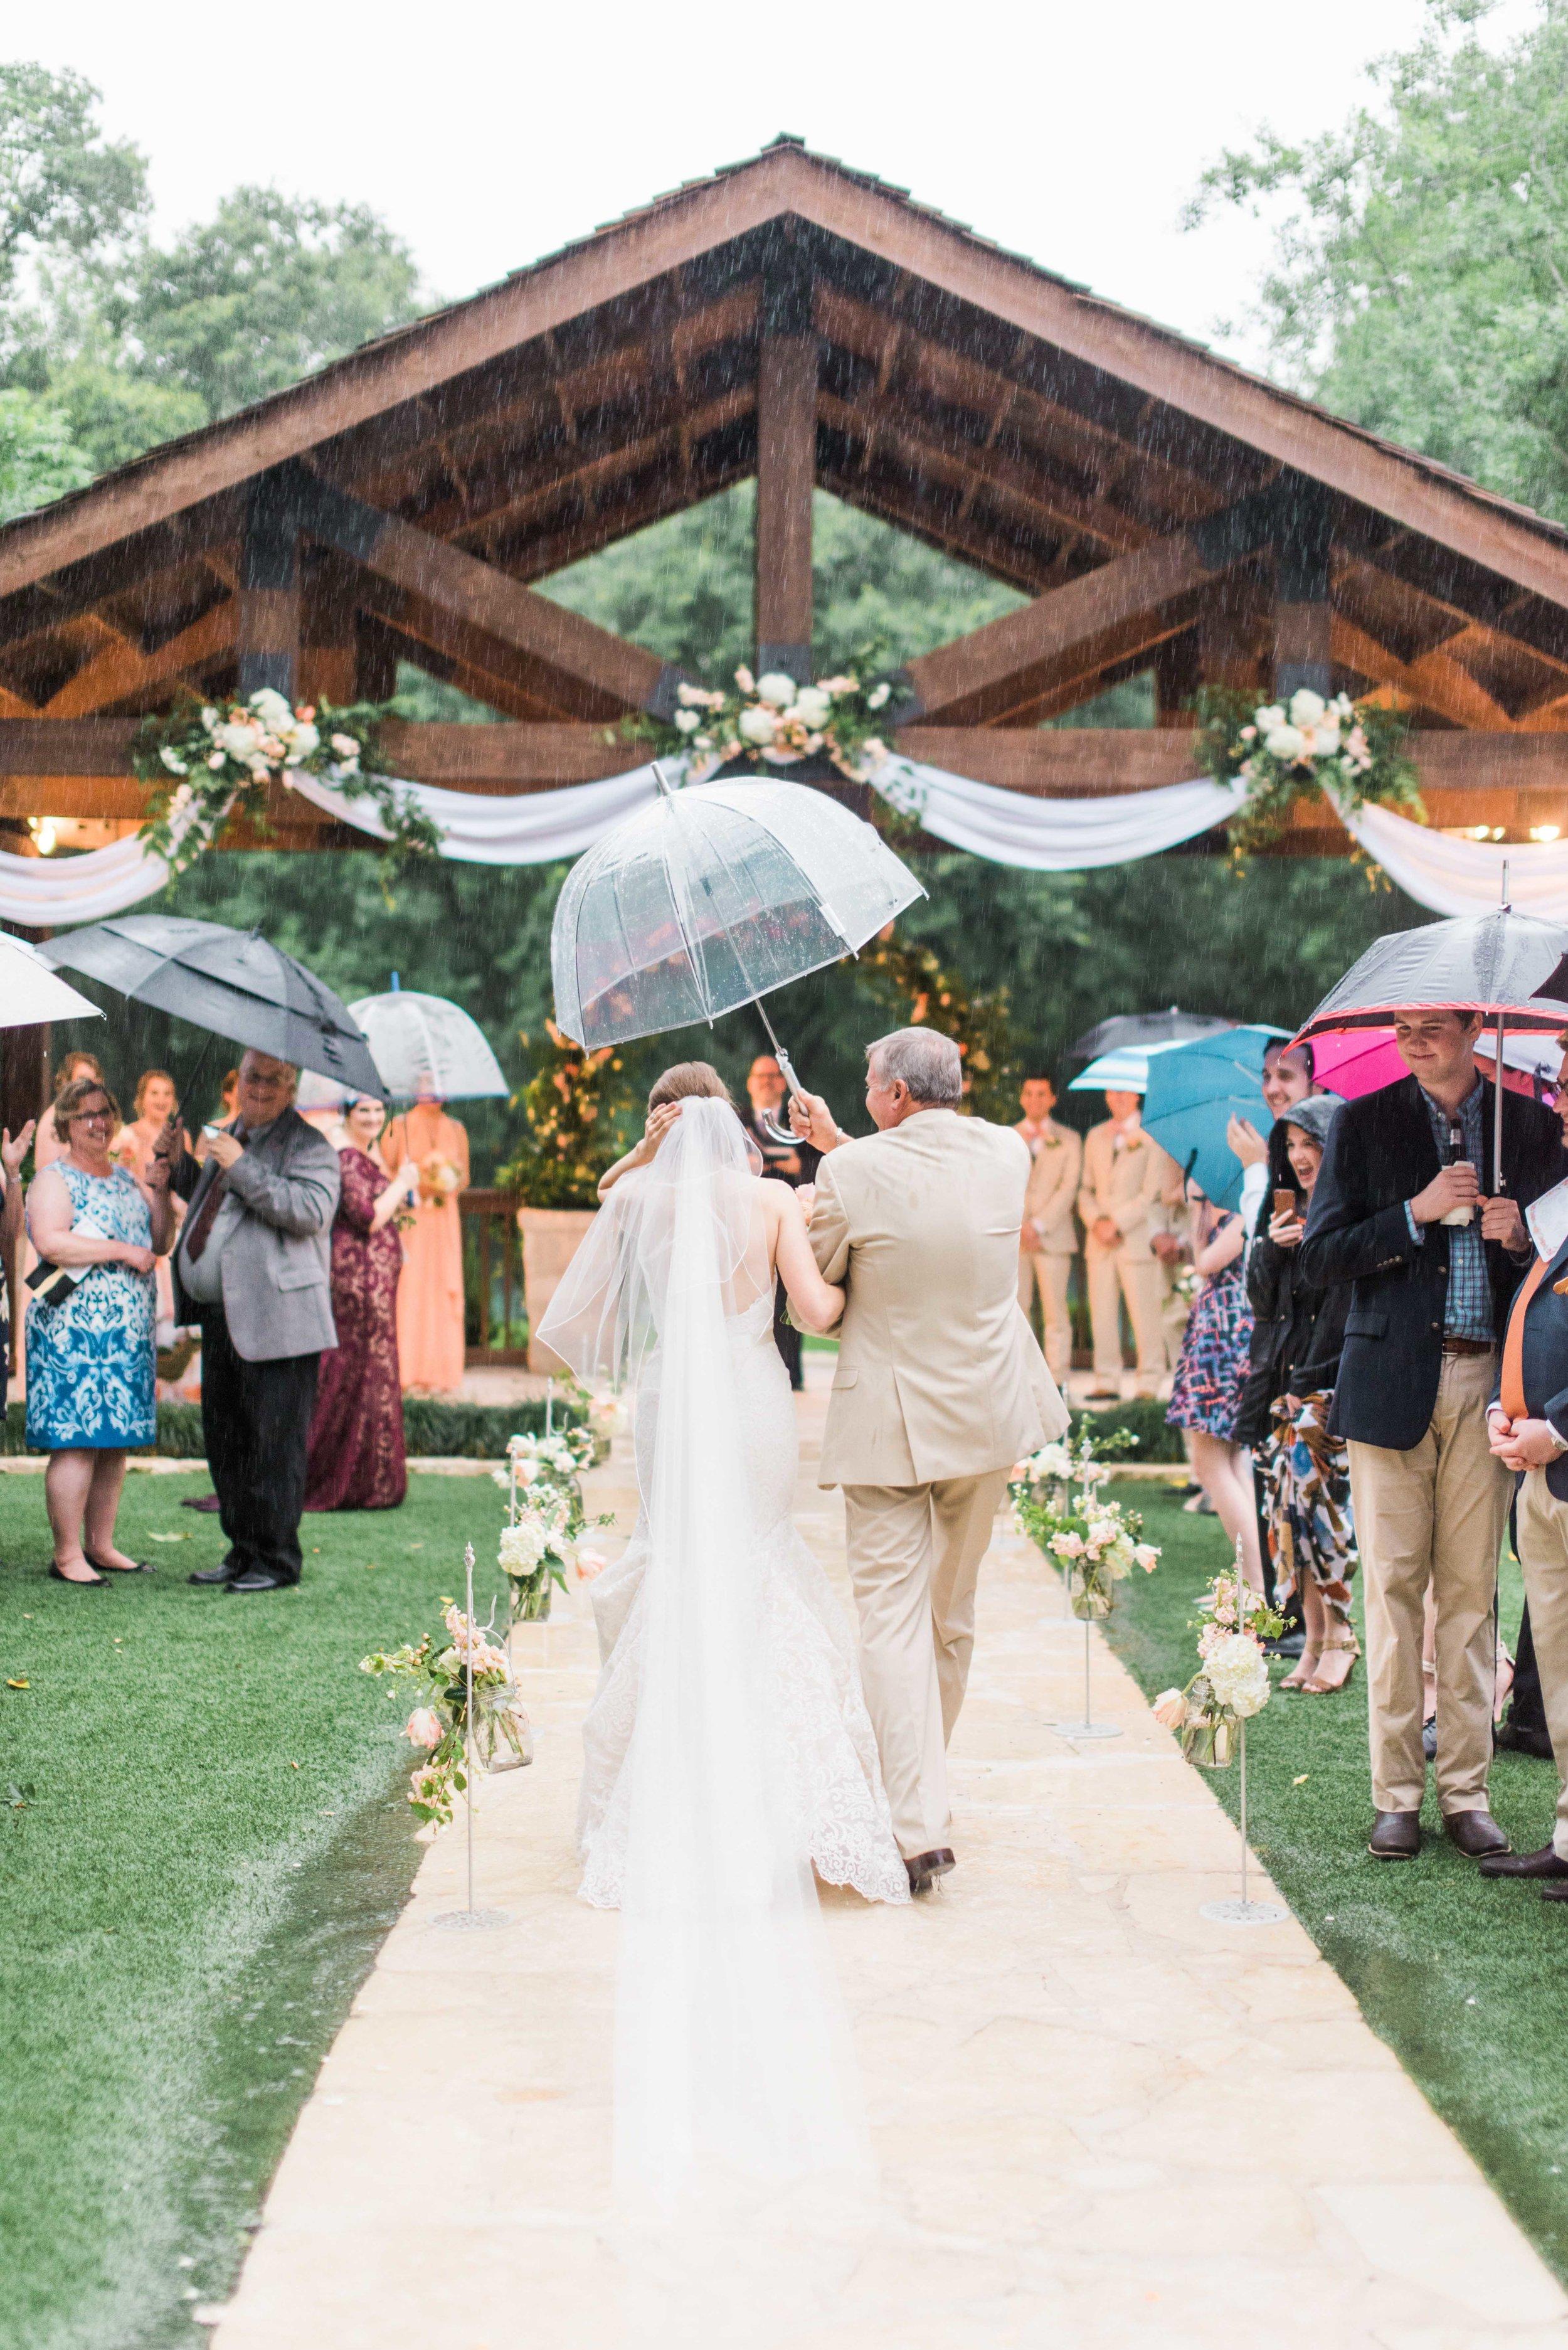 The-Knot-Wedding-Houston-Photographer-Fine-Art-Dana-Fernandez-Photography-Film-12.jpg